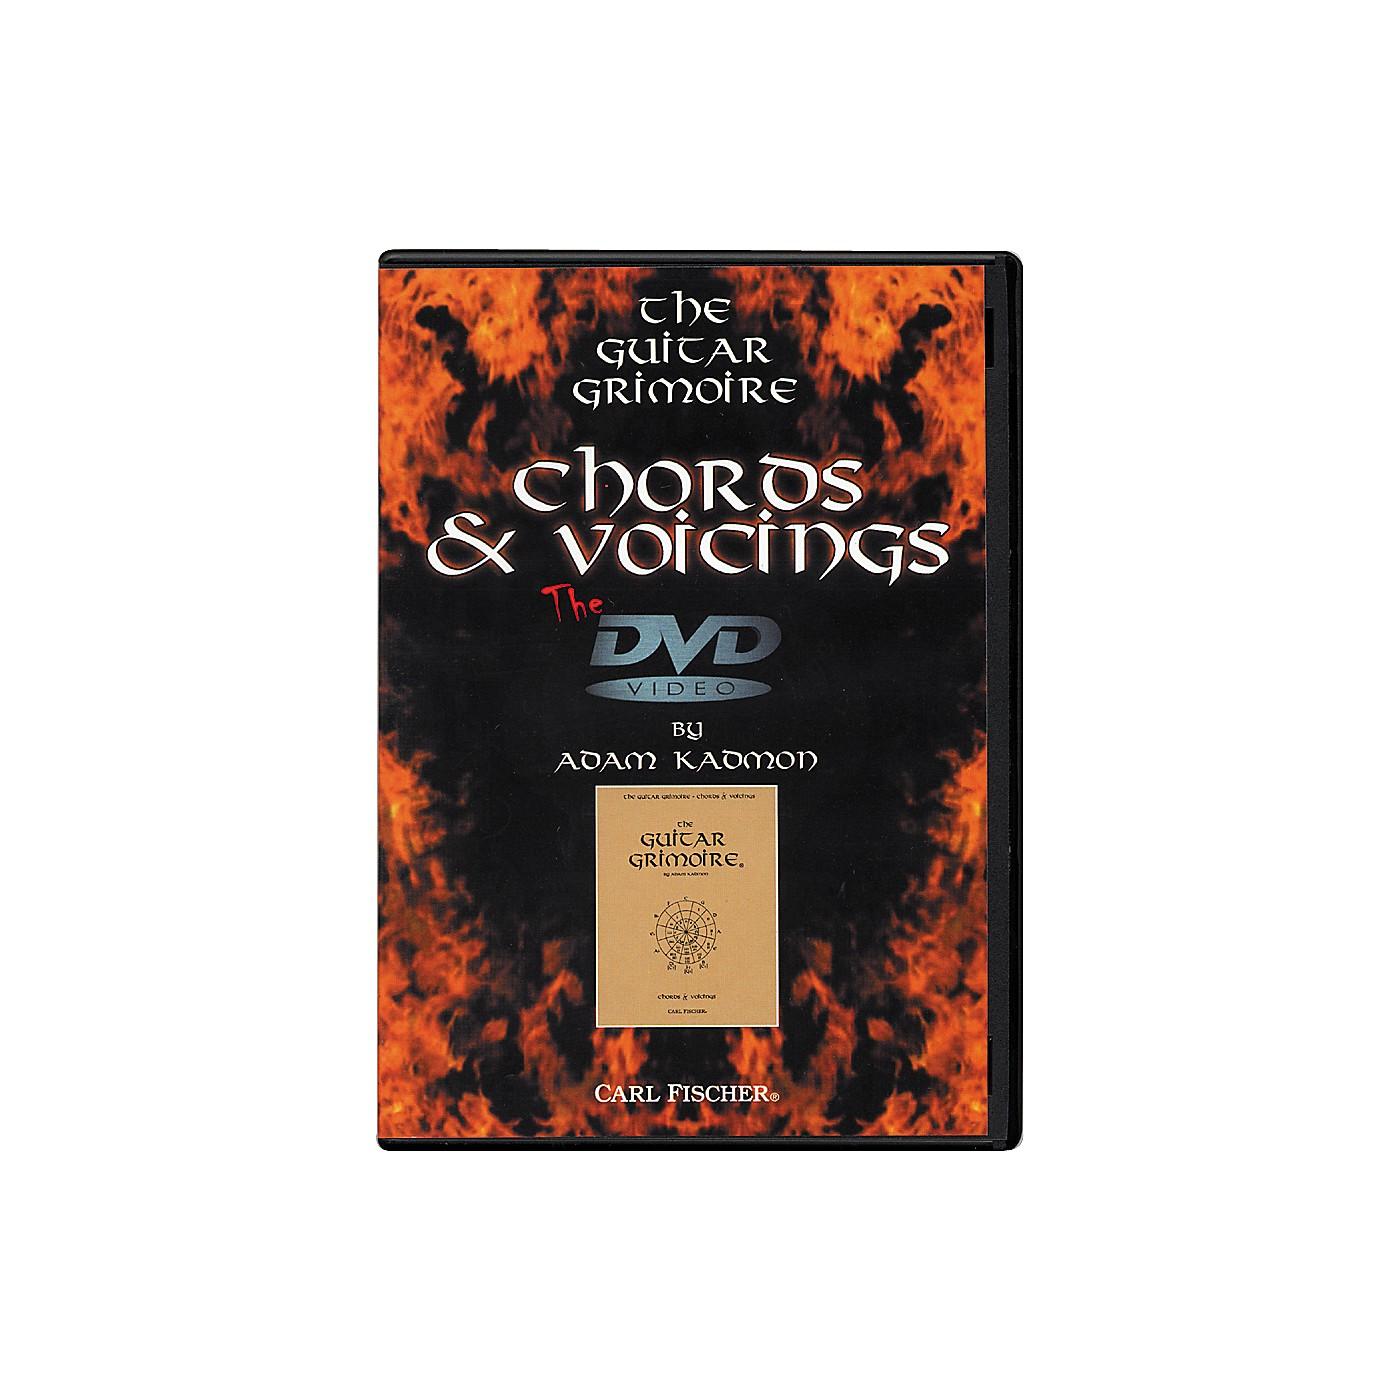 Carl Fischer Guitar Grimoire Vol. 2 Chords and Voicings DVD thumbnail